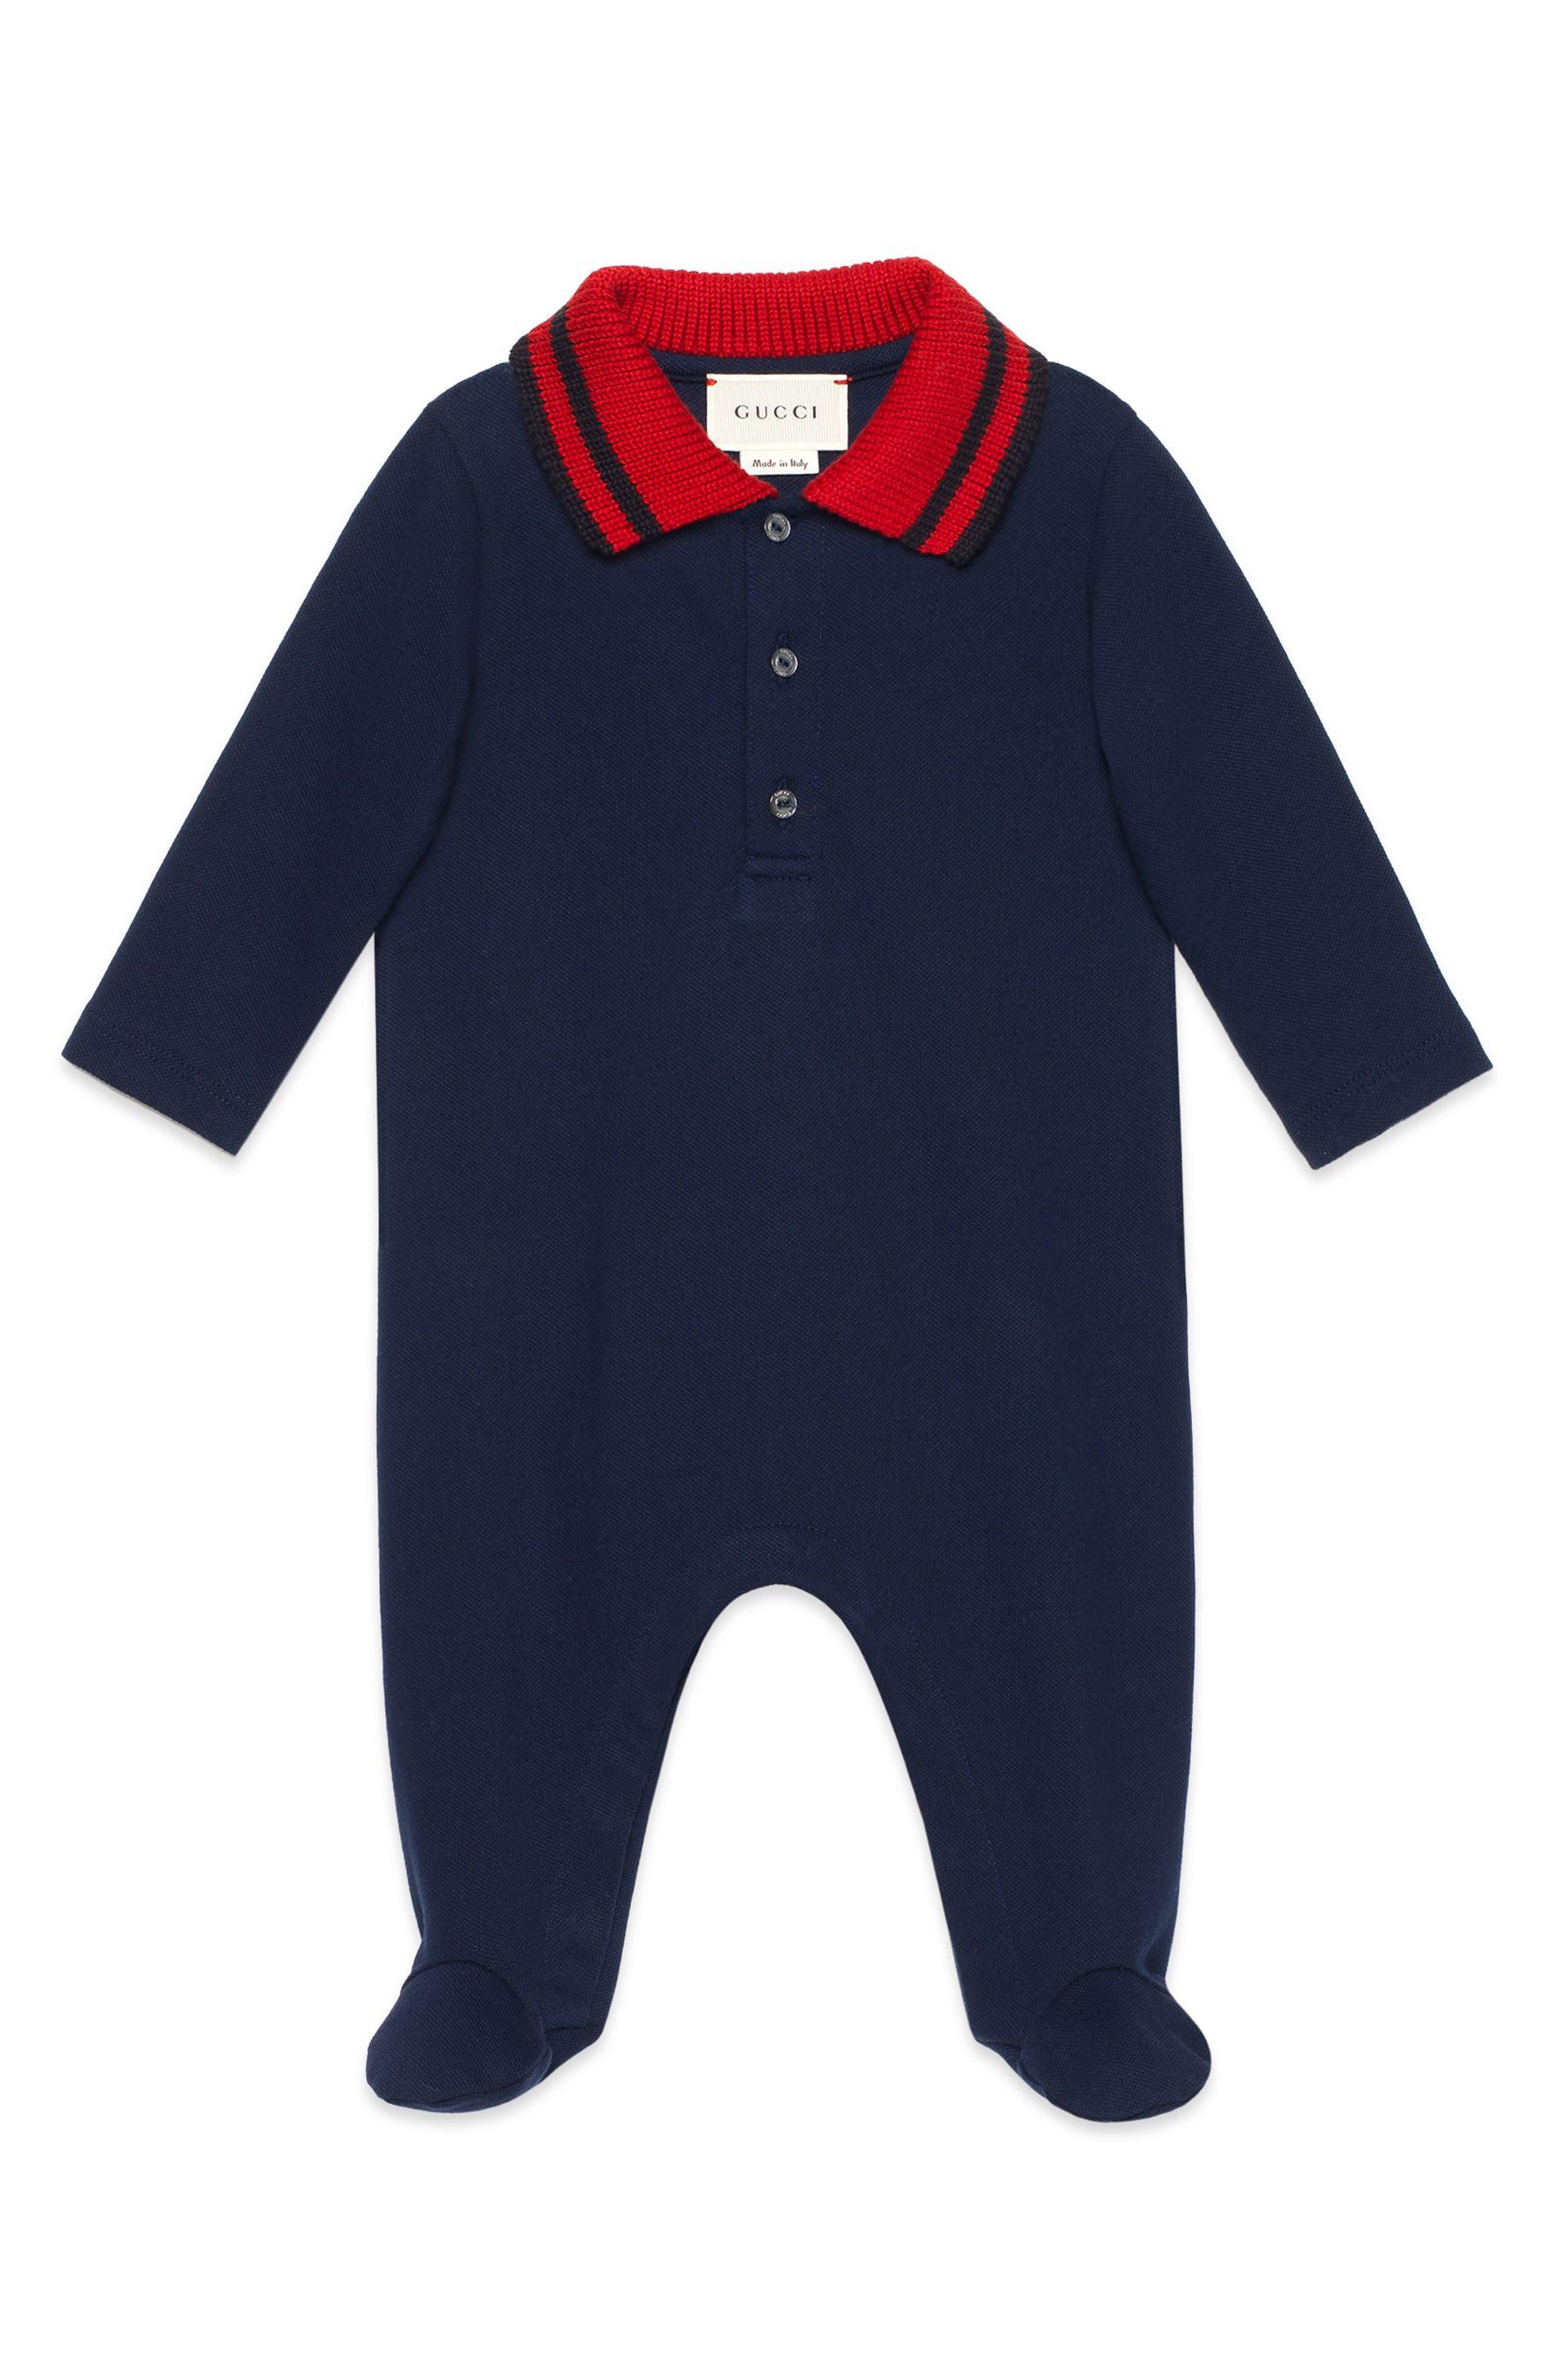 Gucci Stripe Collar Footie (Baby)